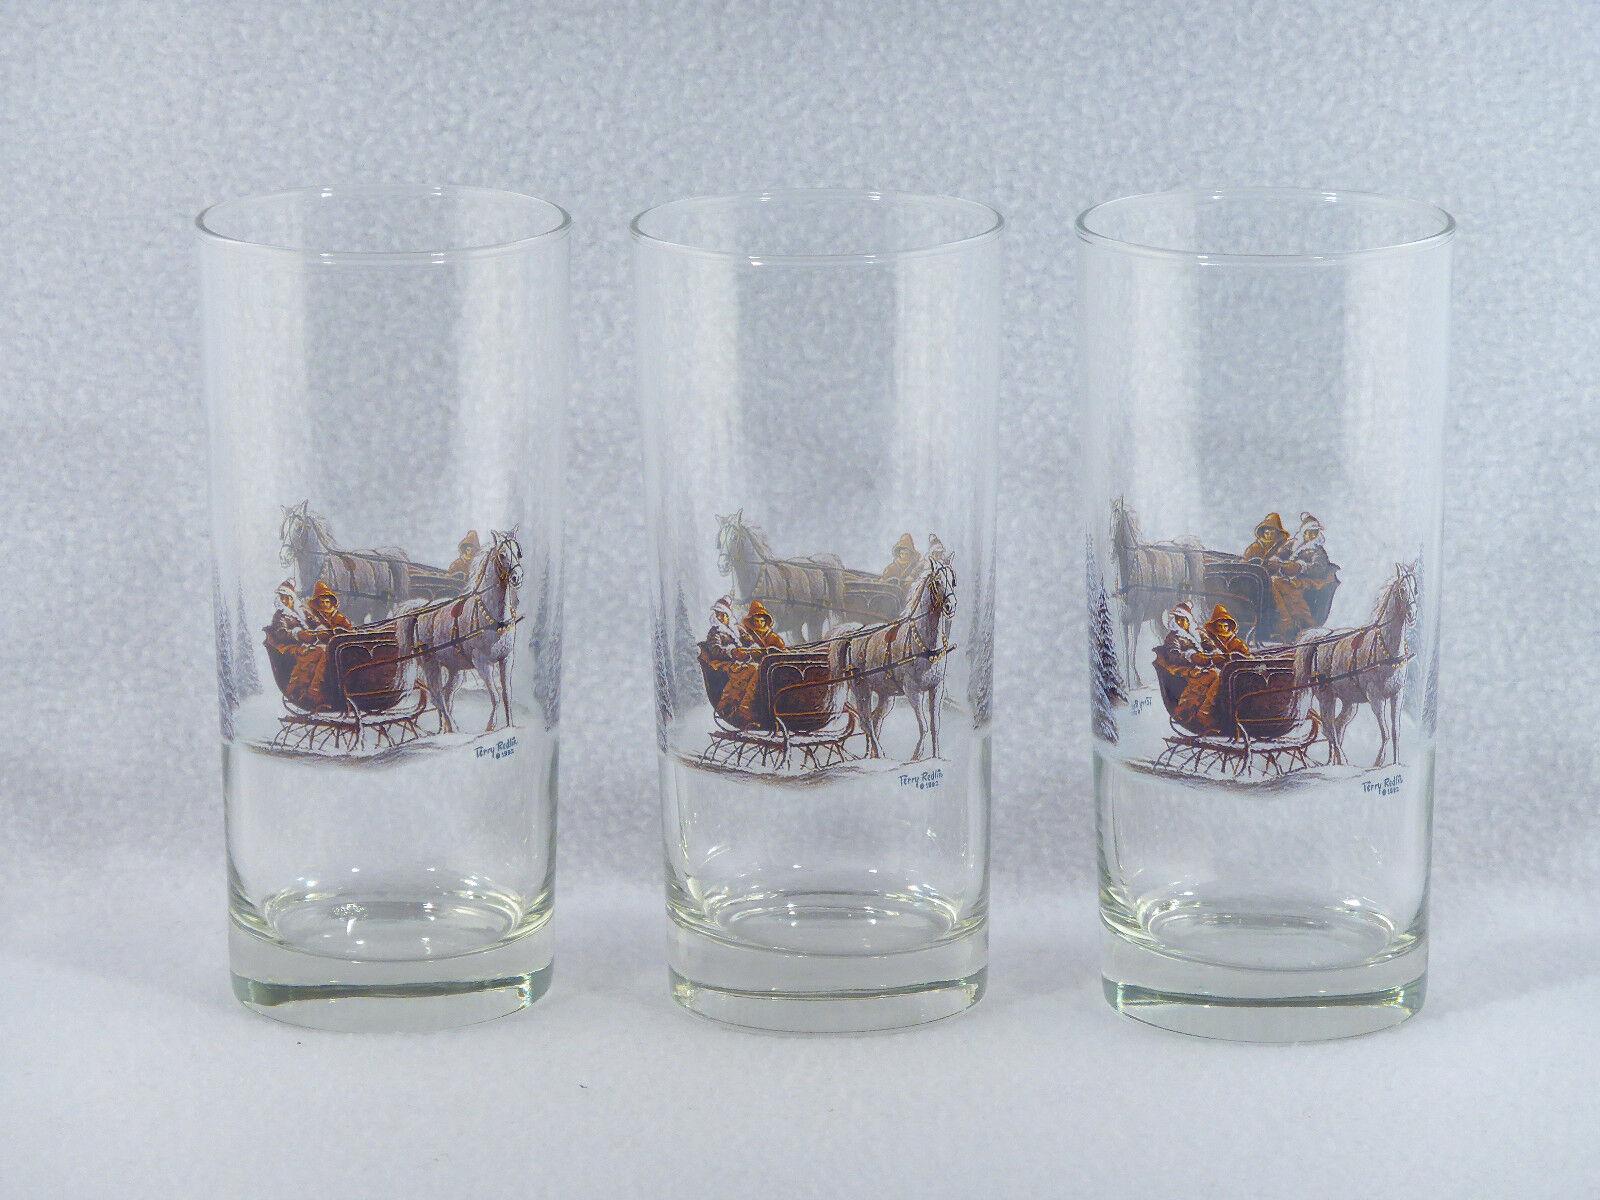 Terry Redlin HORSE & SLEIGH 14 oz. Drinking Glasses Tumblers - Set of 3